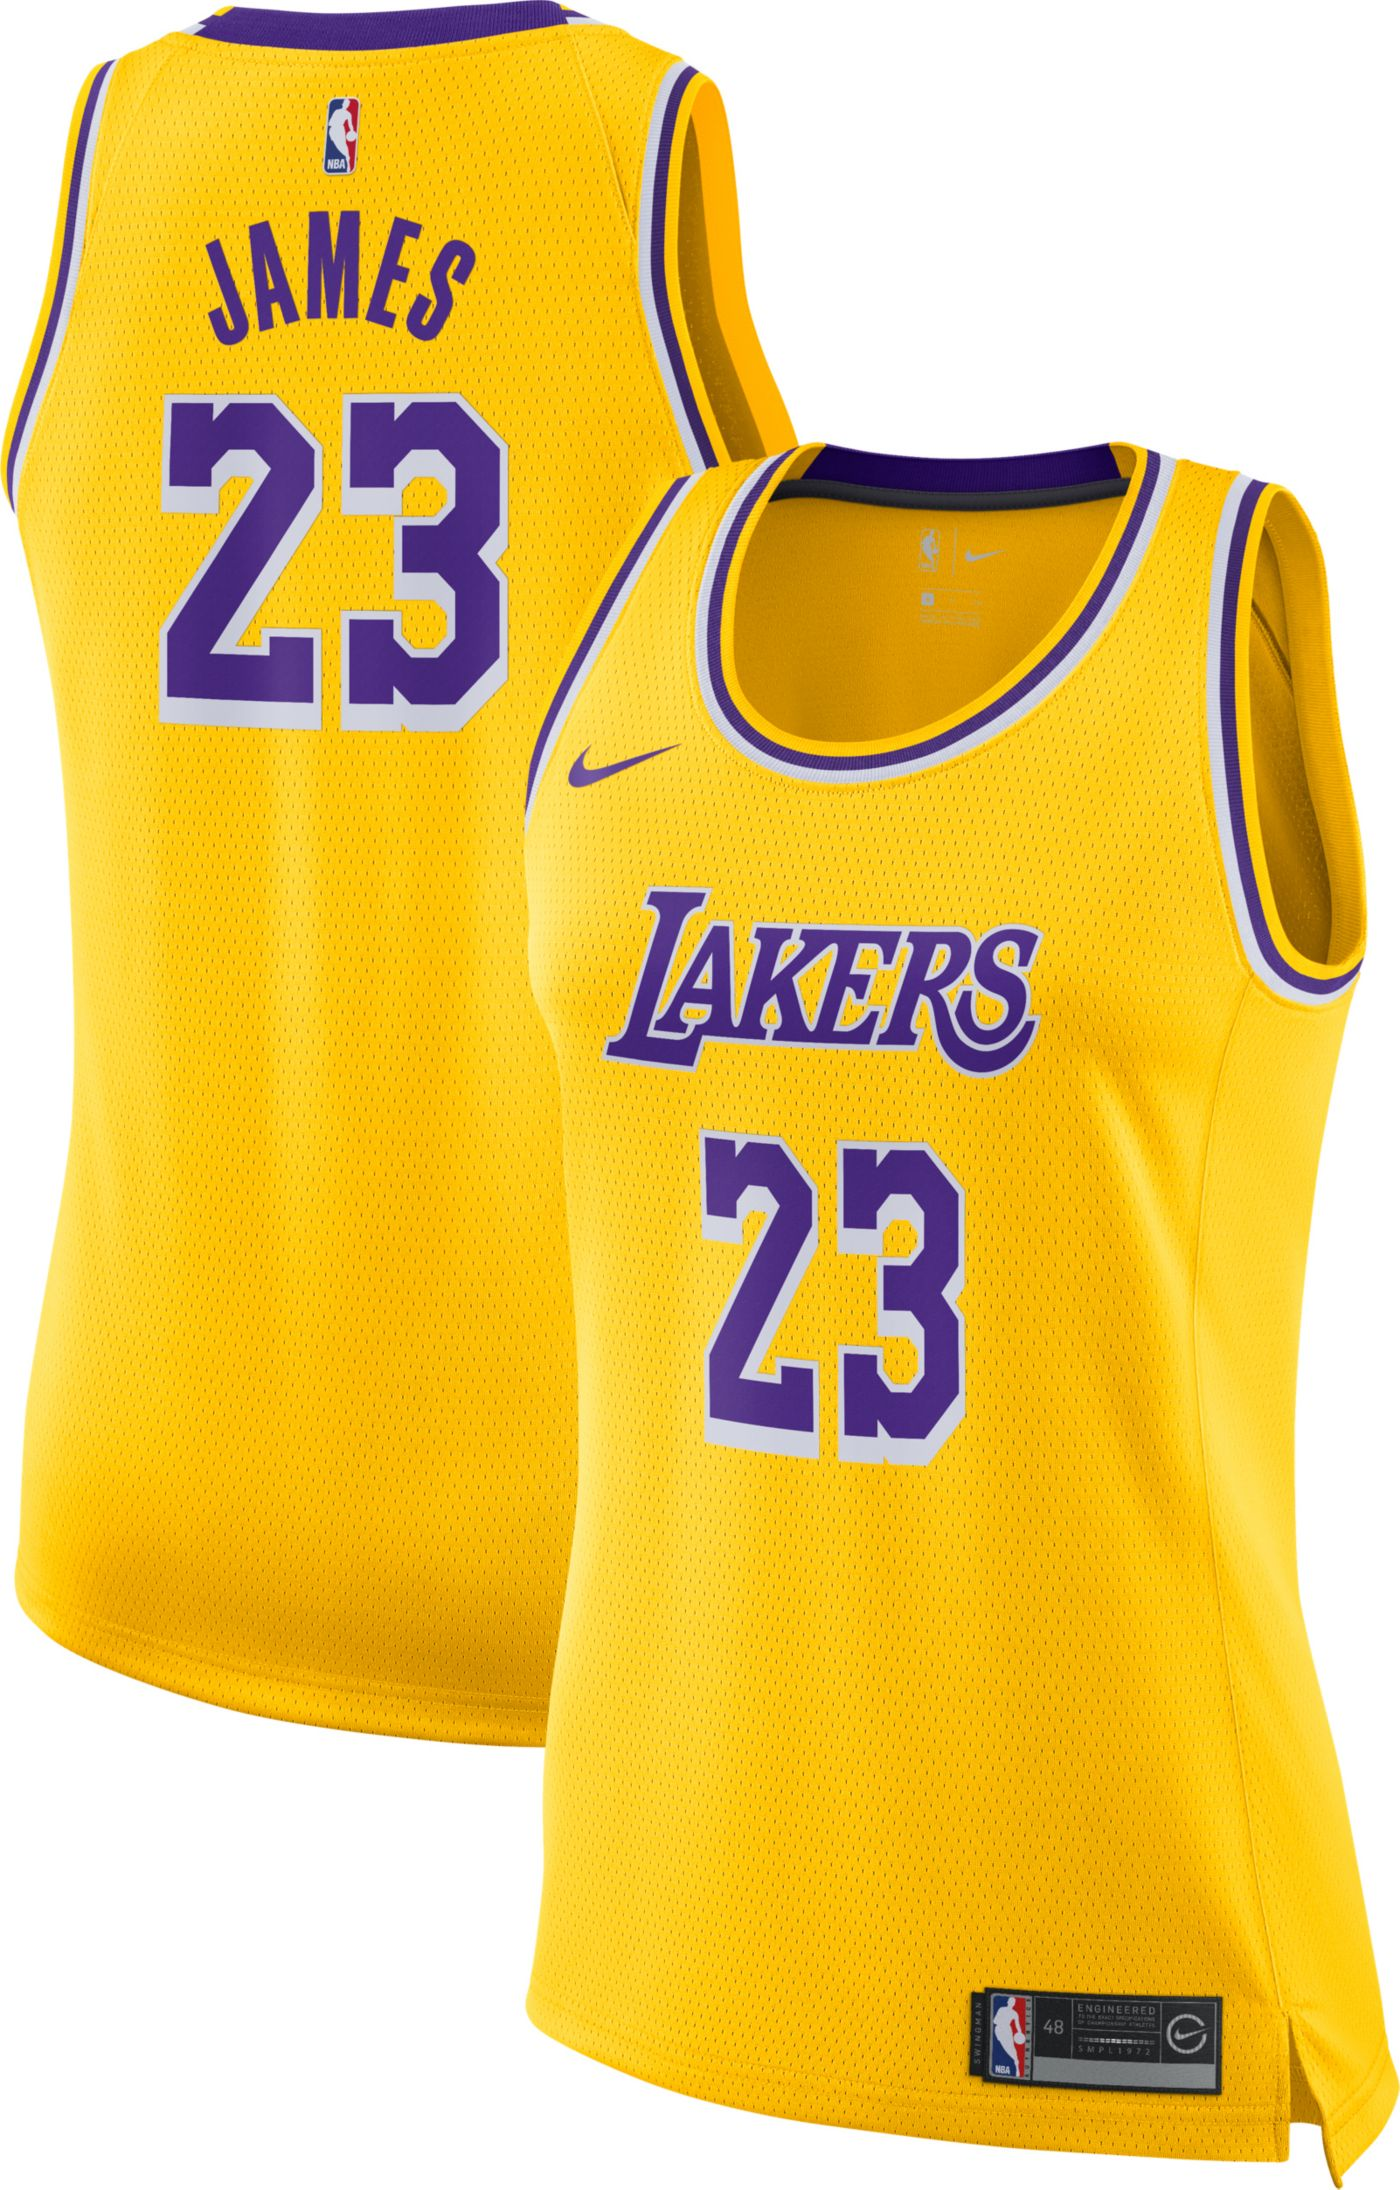 Nike Women's Los Angeles Lakers LeBron James #23 Gold Dri-FIT Swingman Jersey